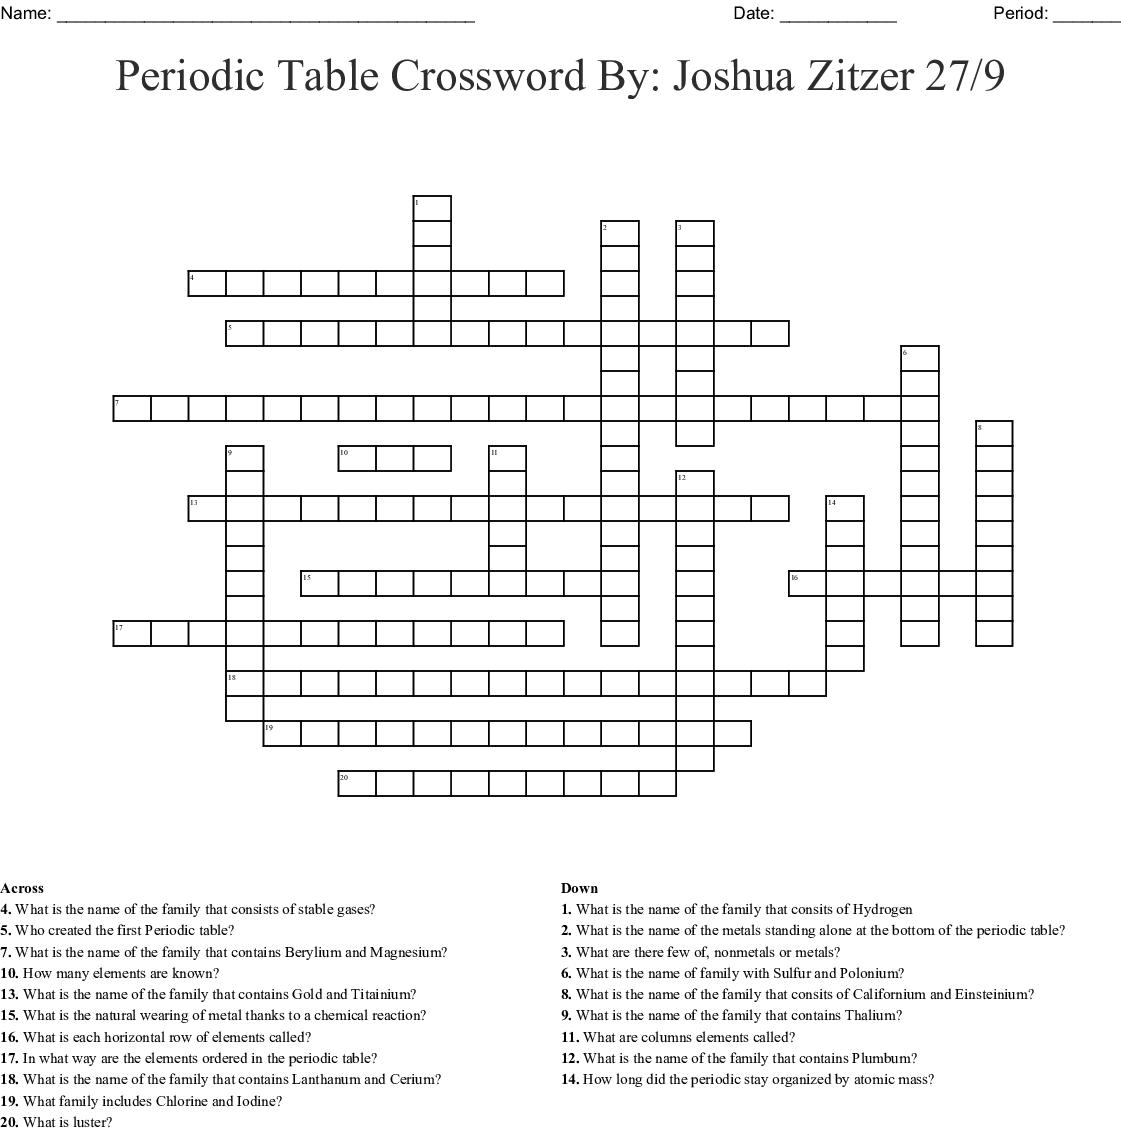 Periodic Table Of Elements Crossword Puzzle